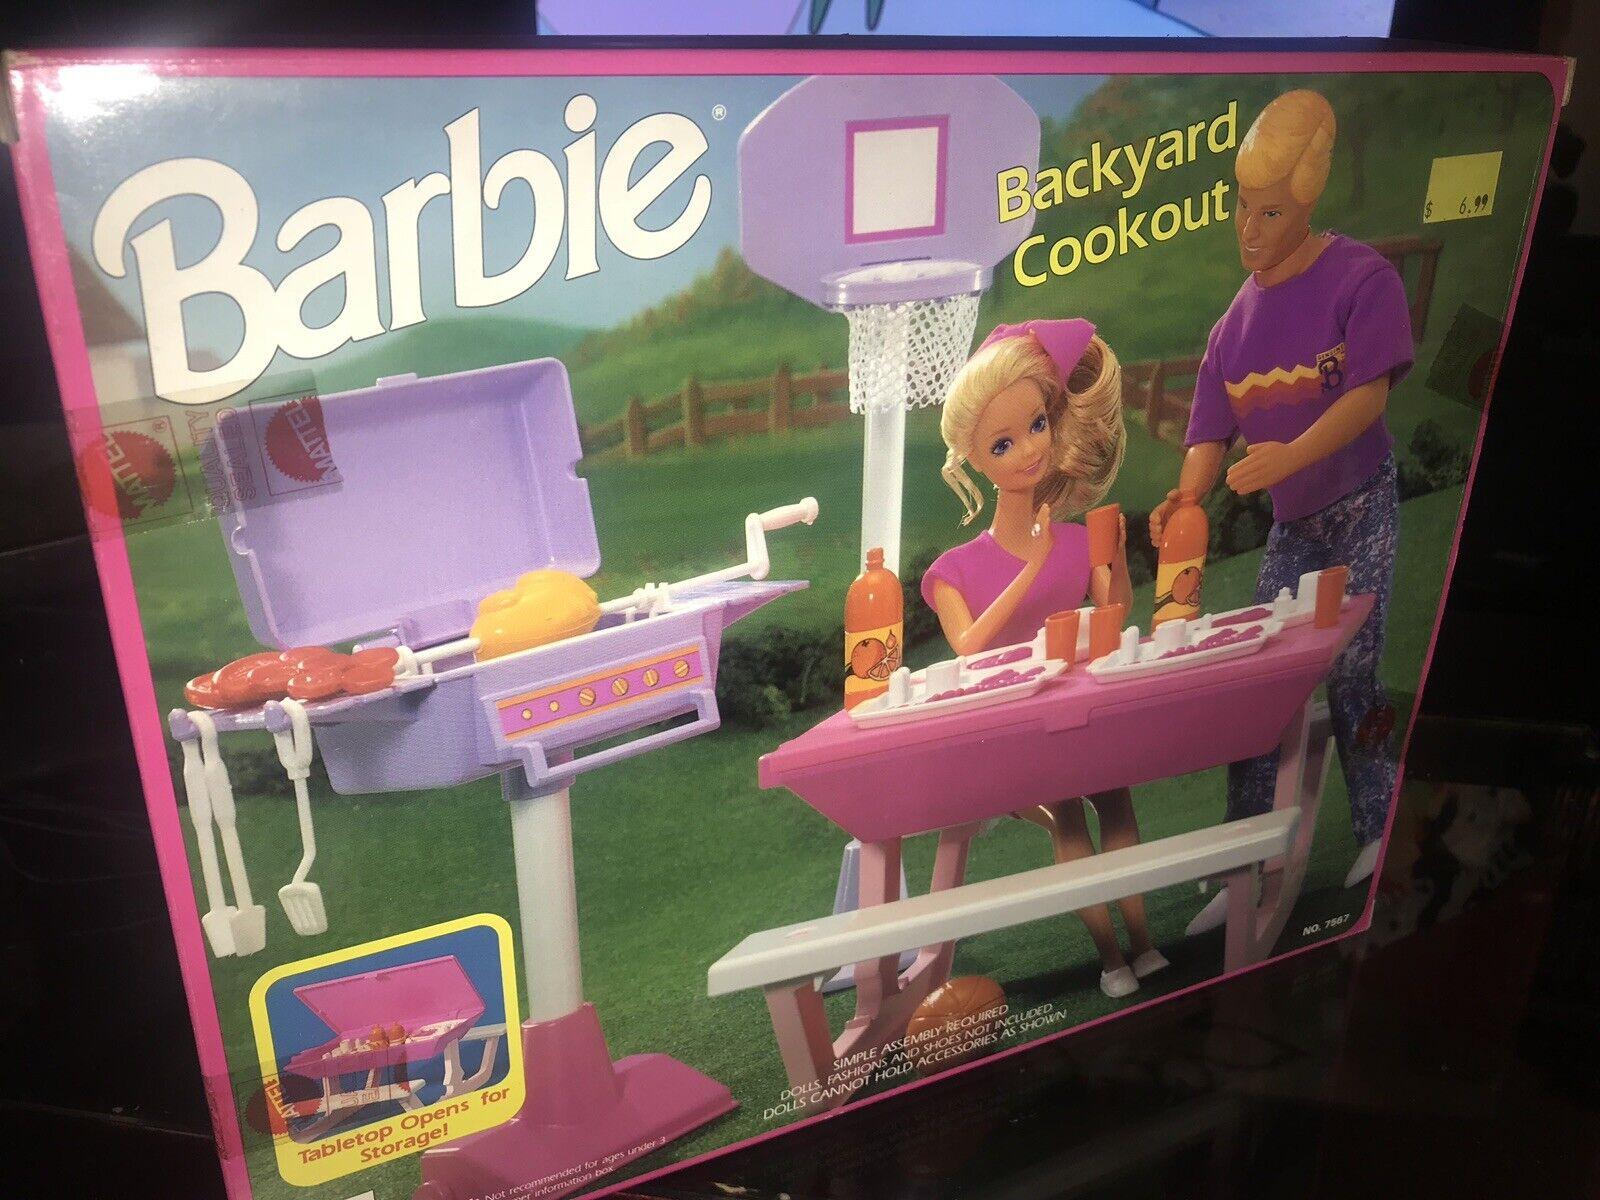 Barbie Vintage Backyard Cookout 1992 (Mattel  7567) Factory Sealed; BRAND NEW